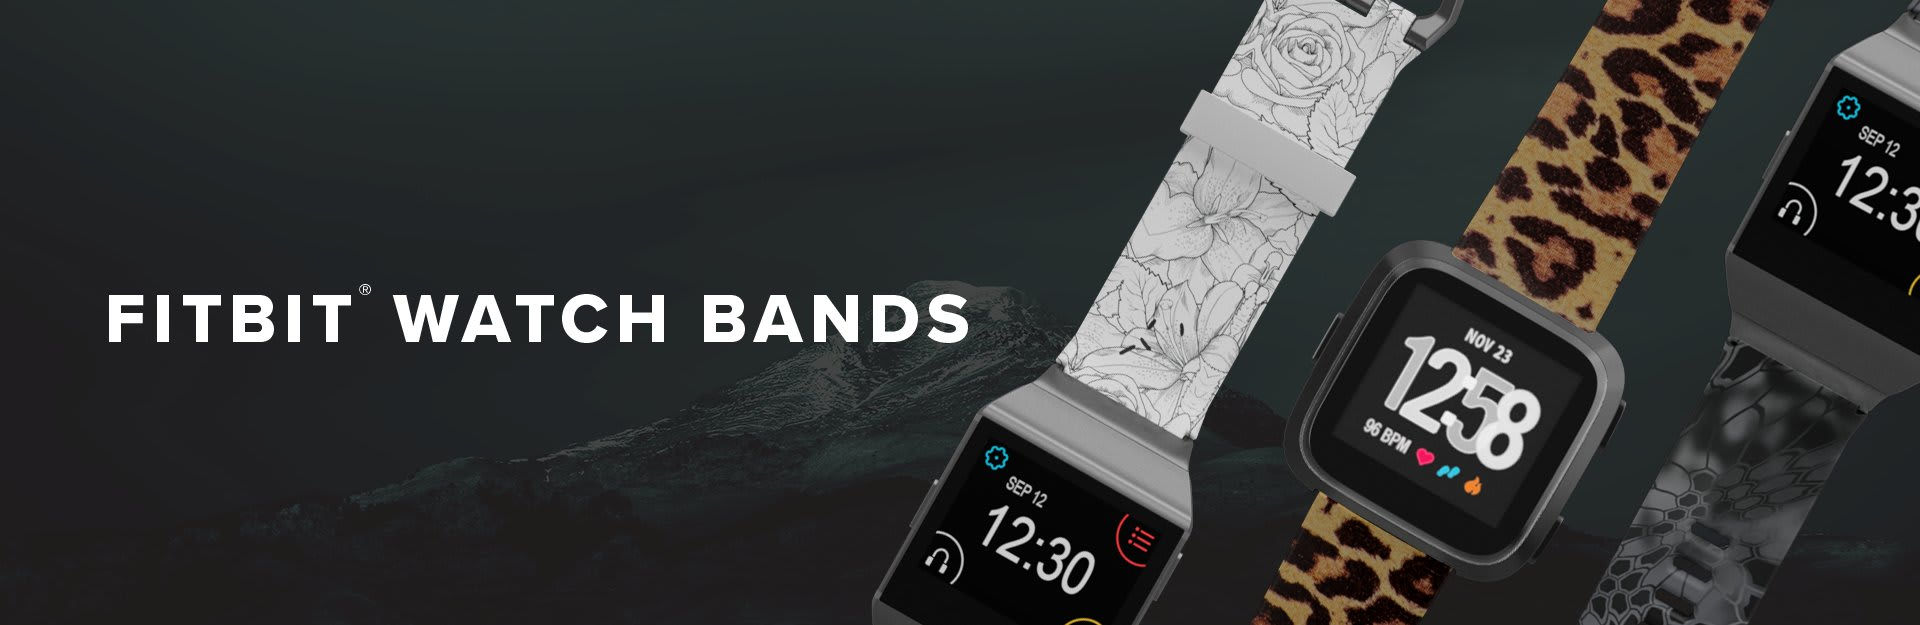 Fitbit Watch Bands, winter rose, leopard, and kryptek typhon alongside each other